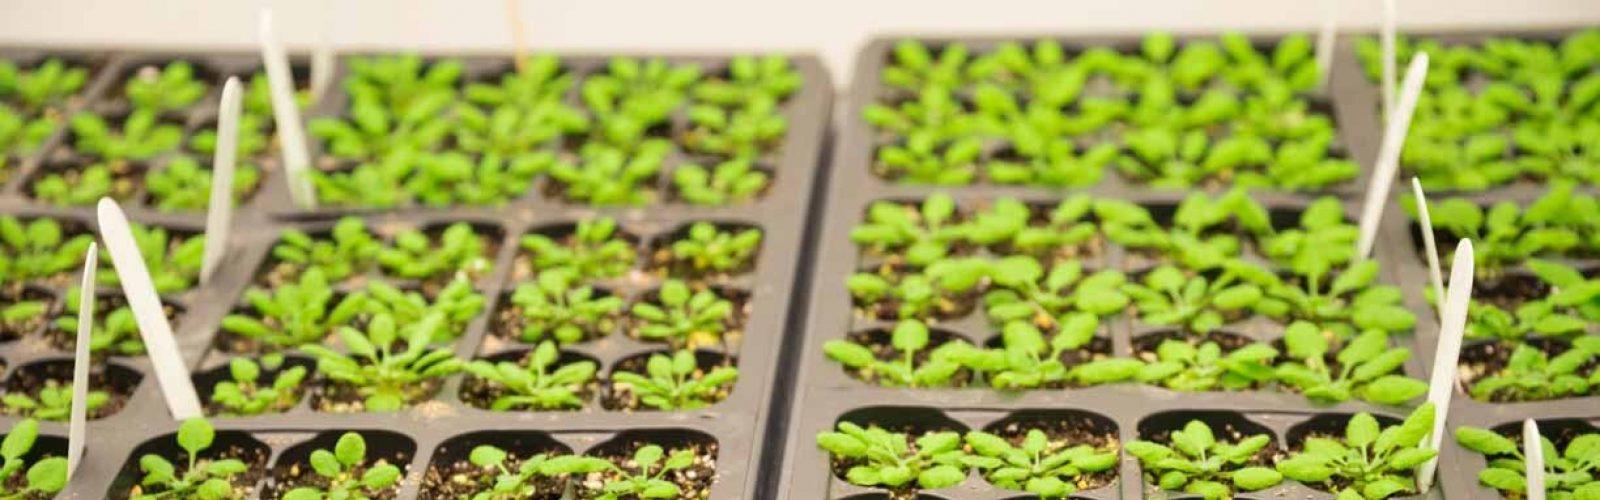 arabidopsis-research